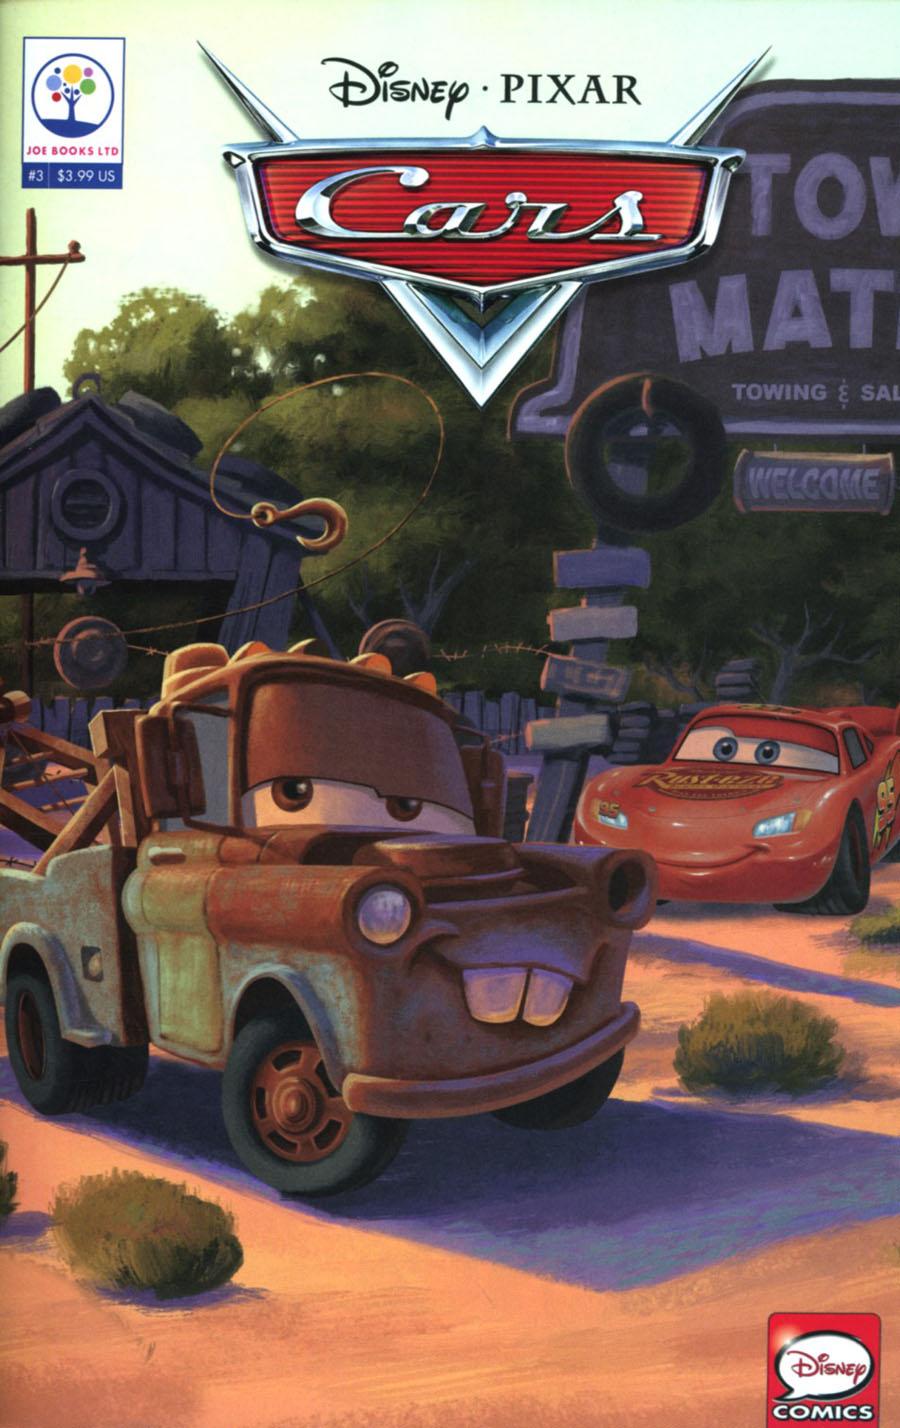 Disney Pixar Cars #3